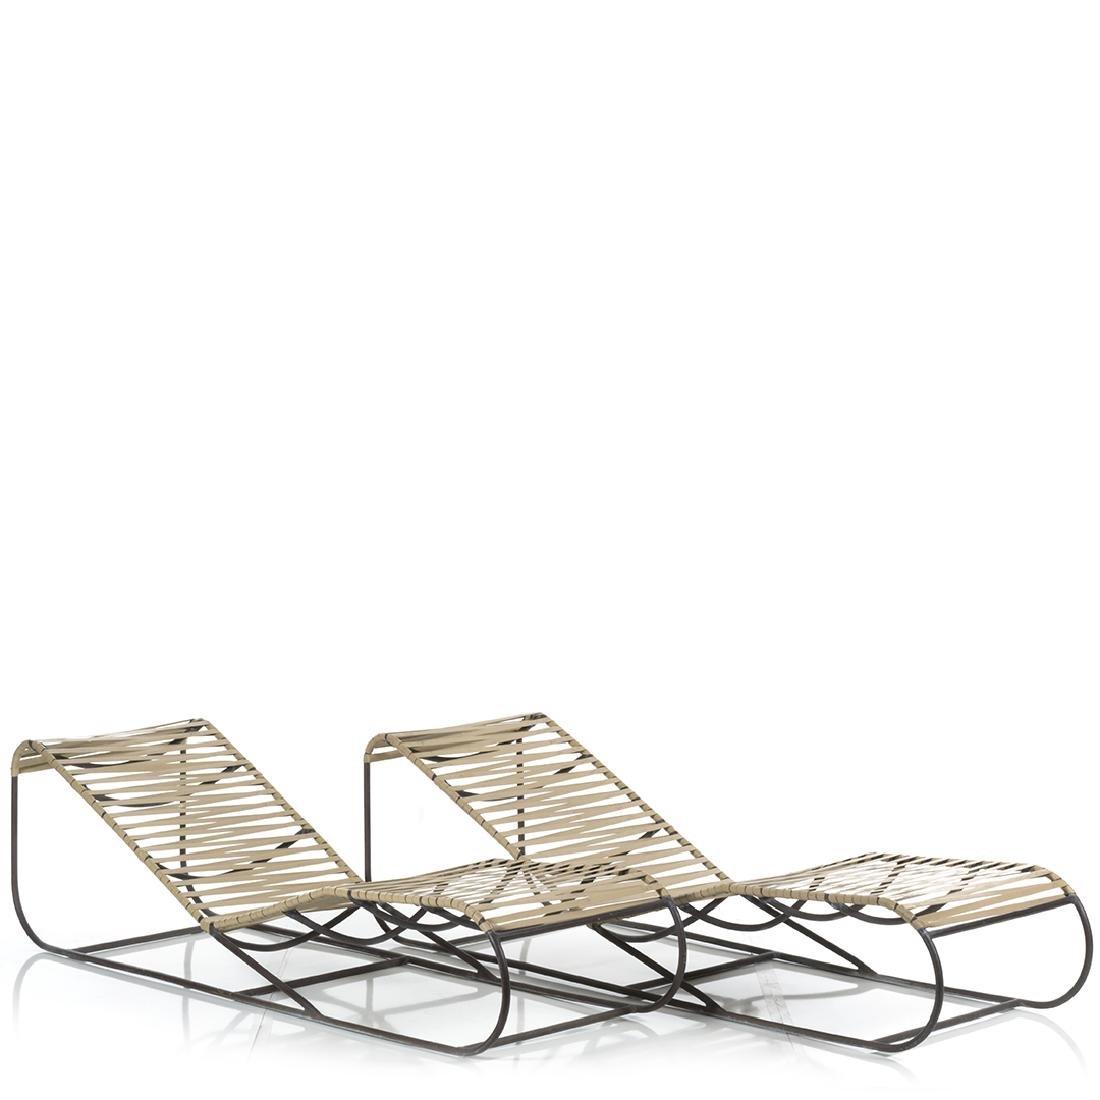 Kipp Stewart Bronze Chaise Lounges (2) - 2